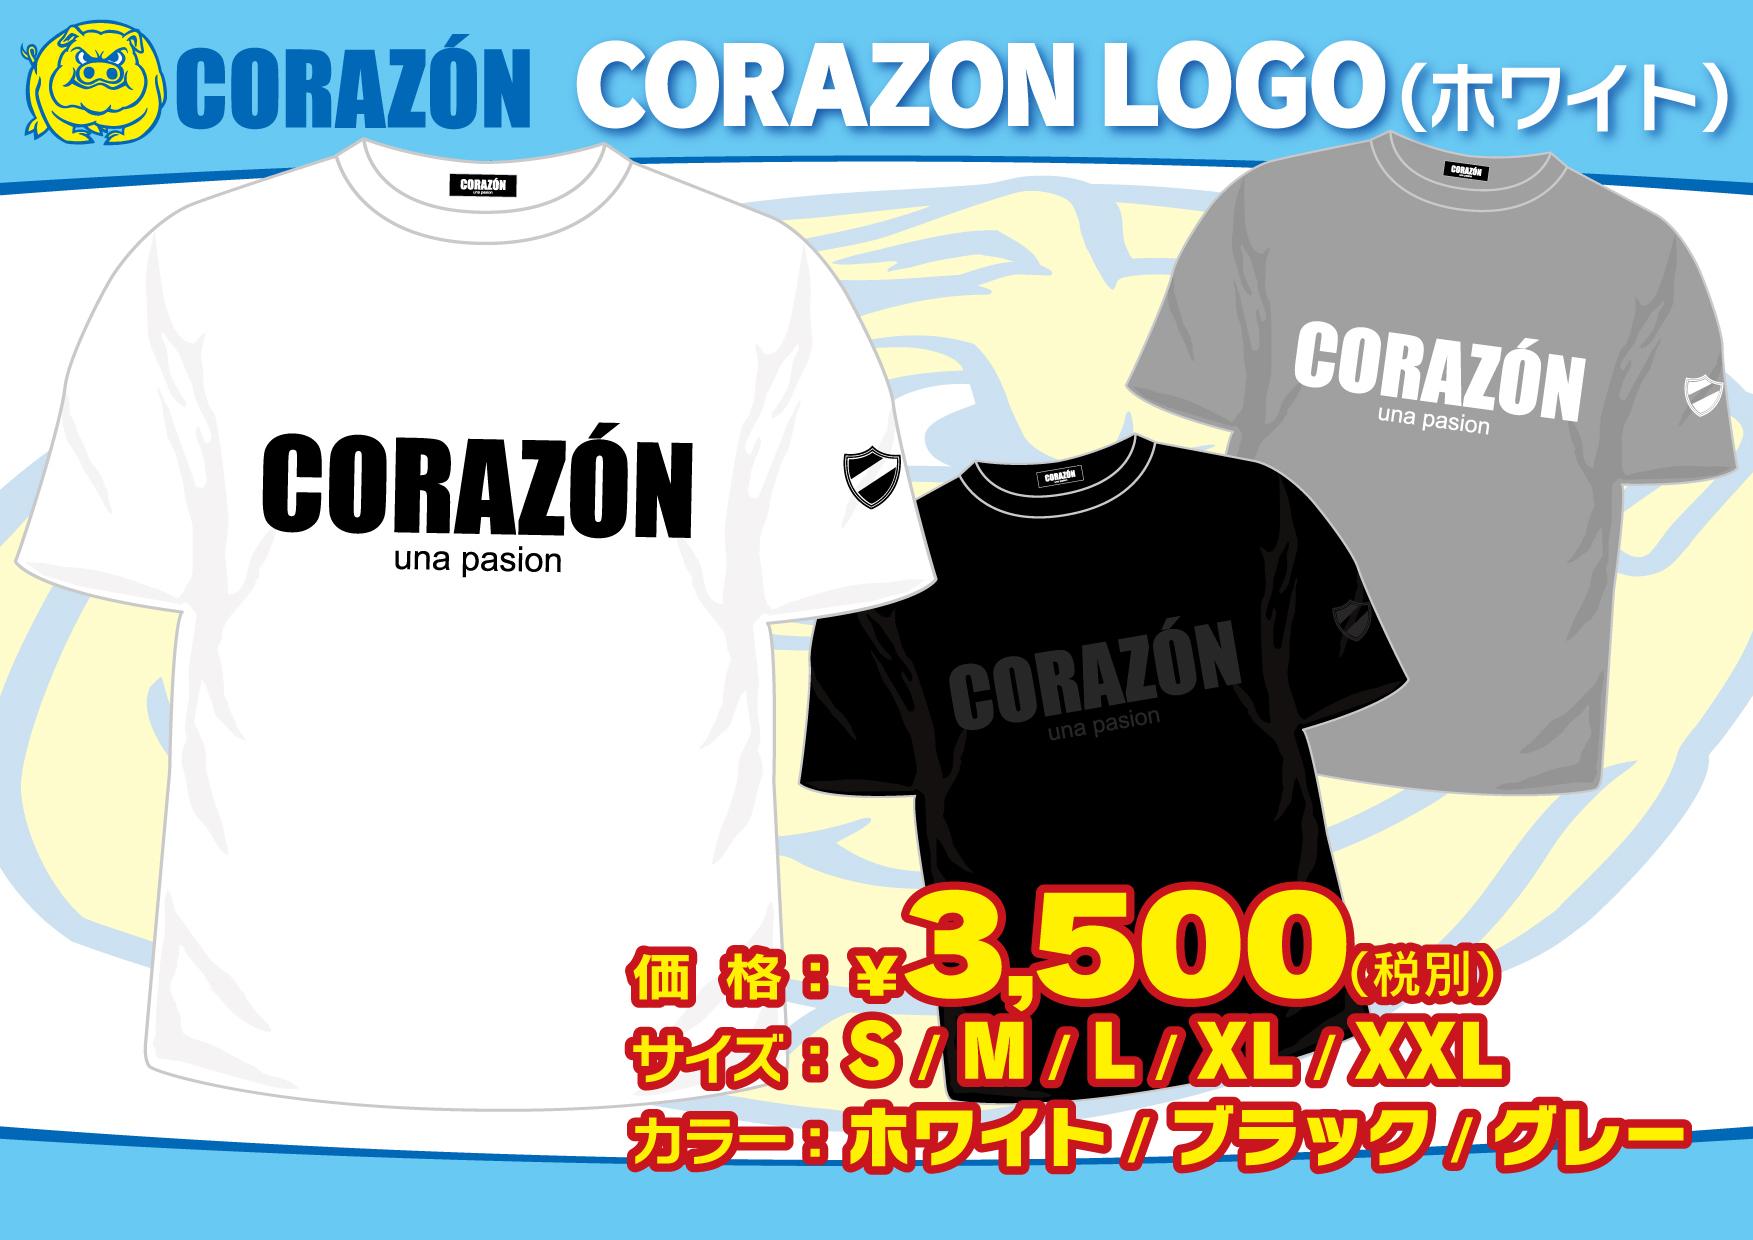 CORAZONロゴ(ホワイト)